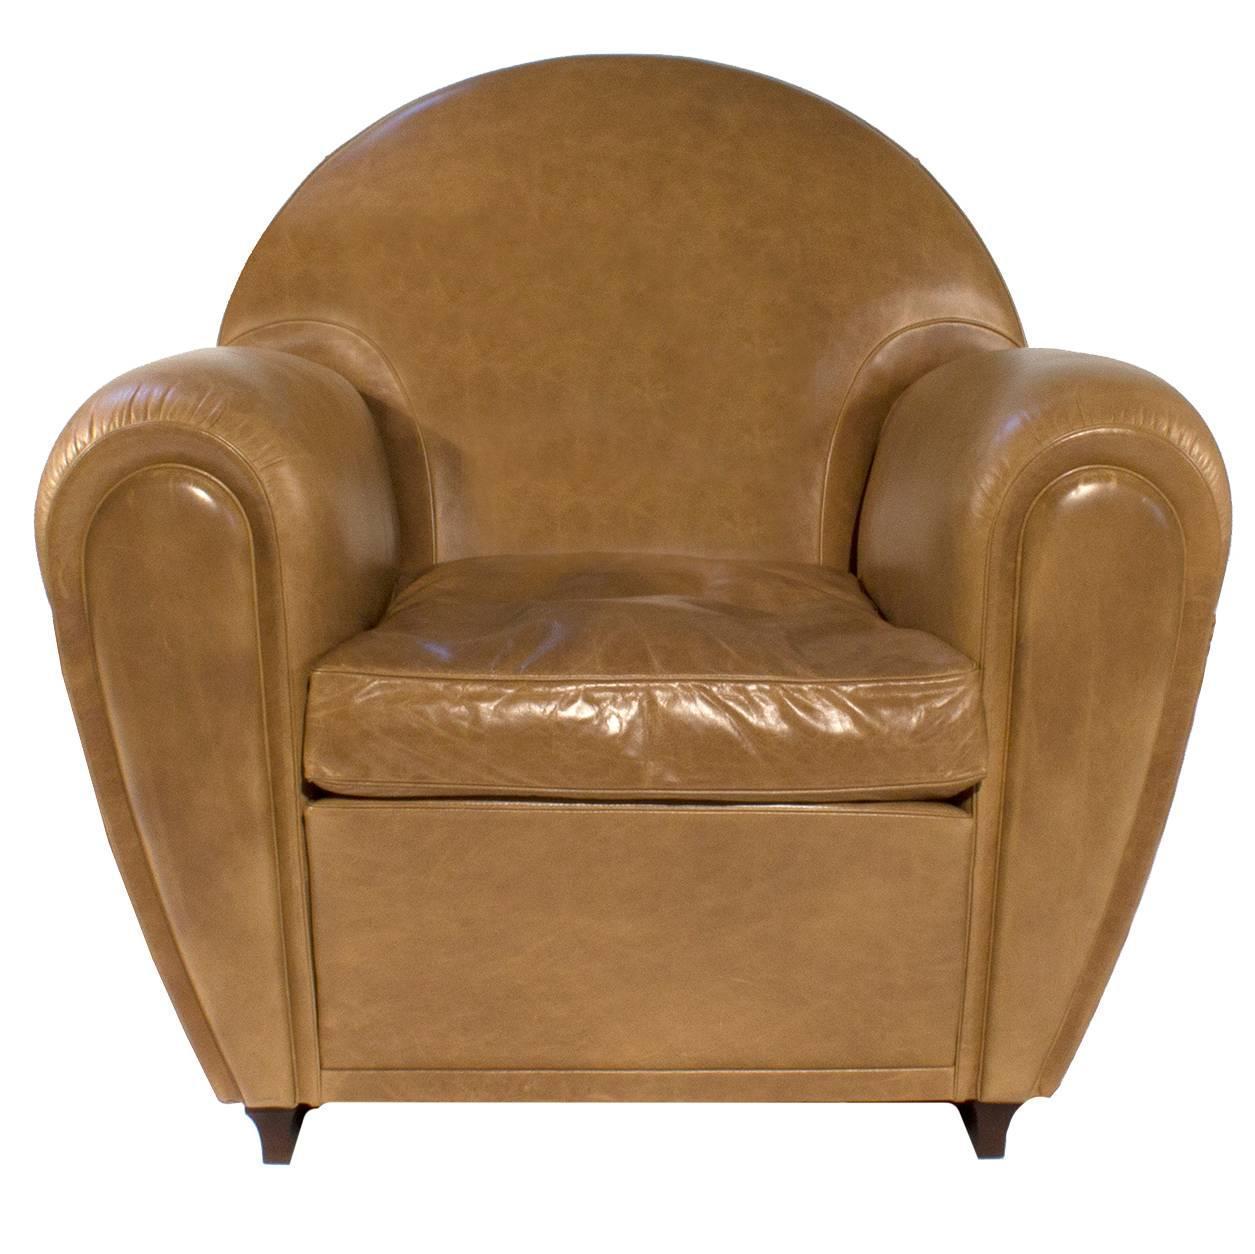 Leather New Age Lounge Armchair by Renzo Frau for Poltrona Frau ...